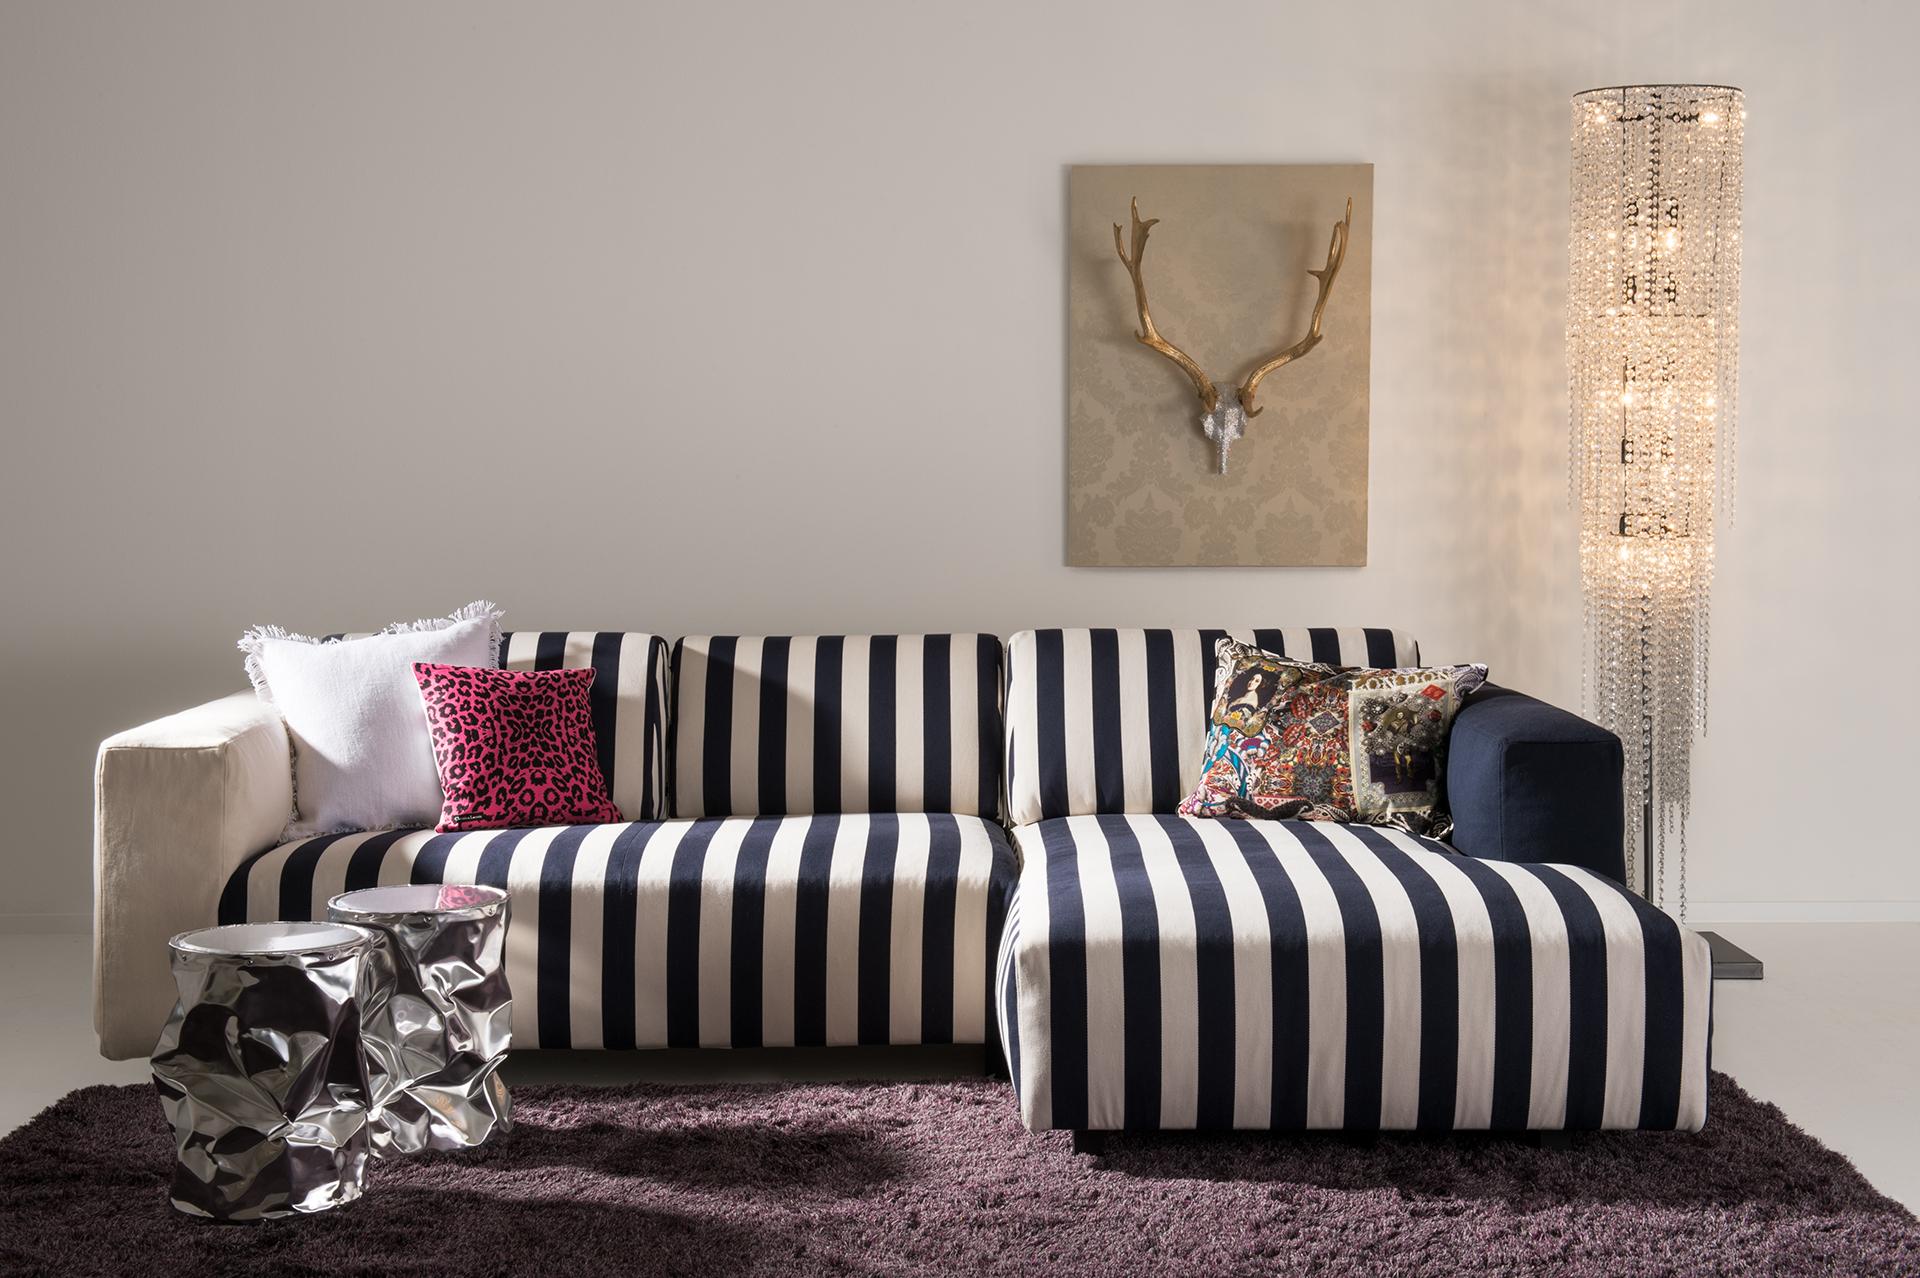 Design Moebel, Interieur, Sofa, Anna M. Traenkner Fotografie Hamburg